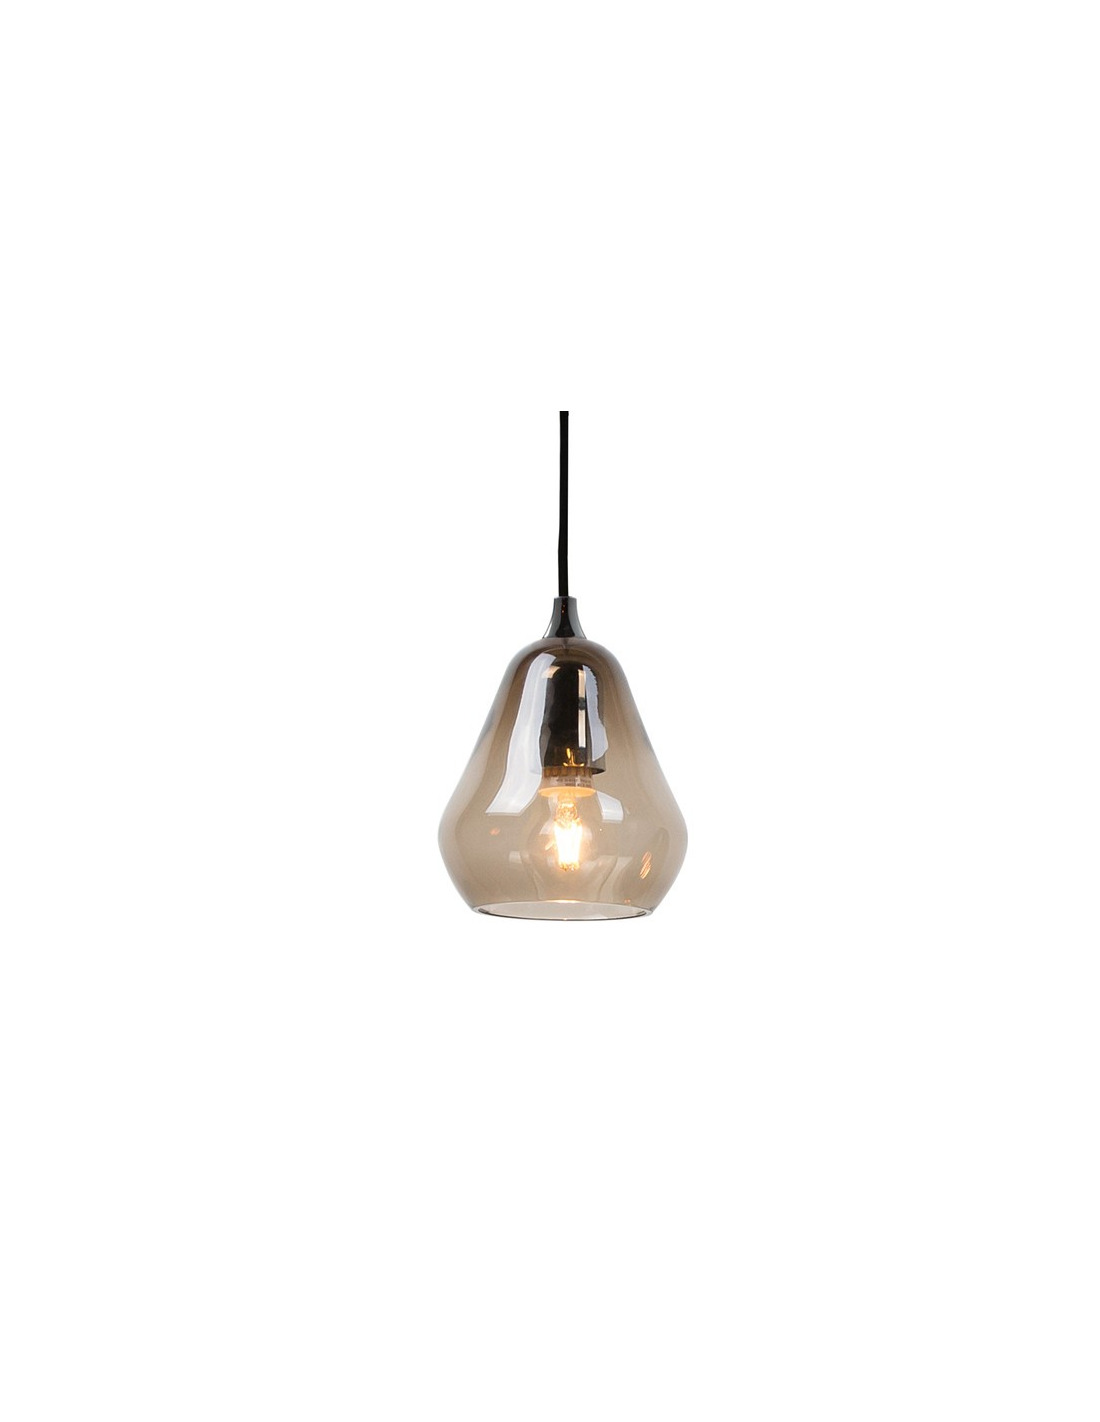 Lampadaire, Le vita, blanc, or, LED, 2700k, 570lm, Ø20cm